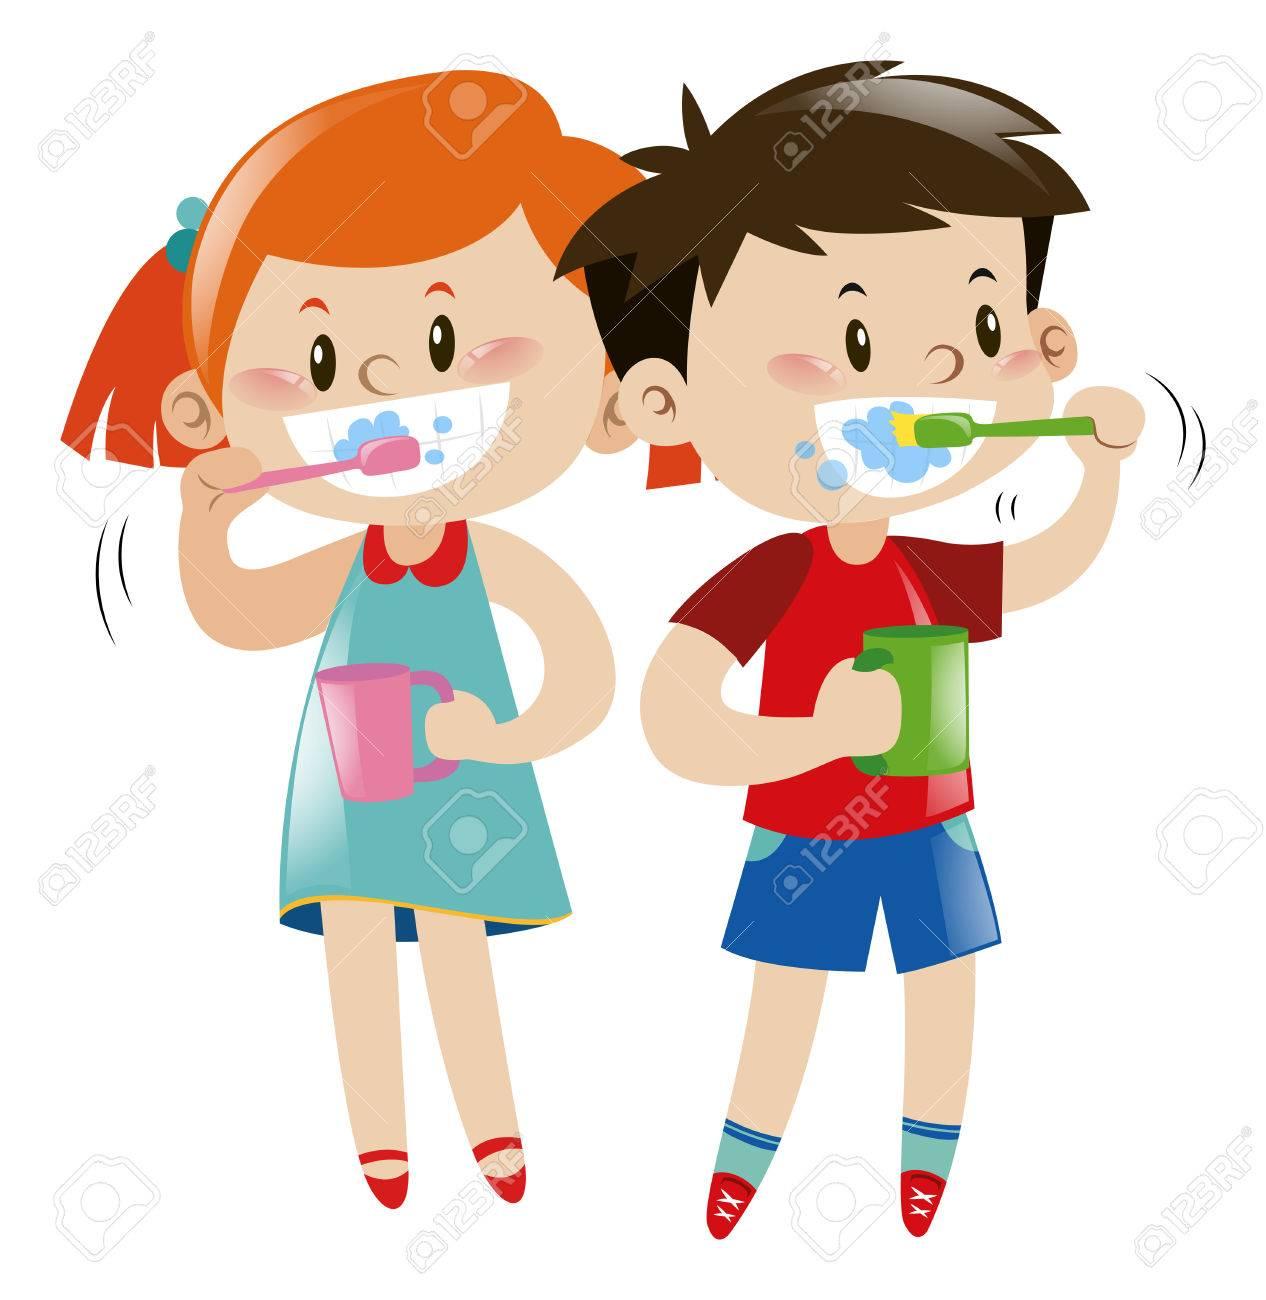 Boy and girl brushing teeth illustration.